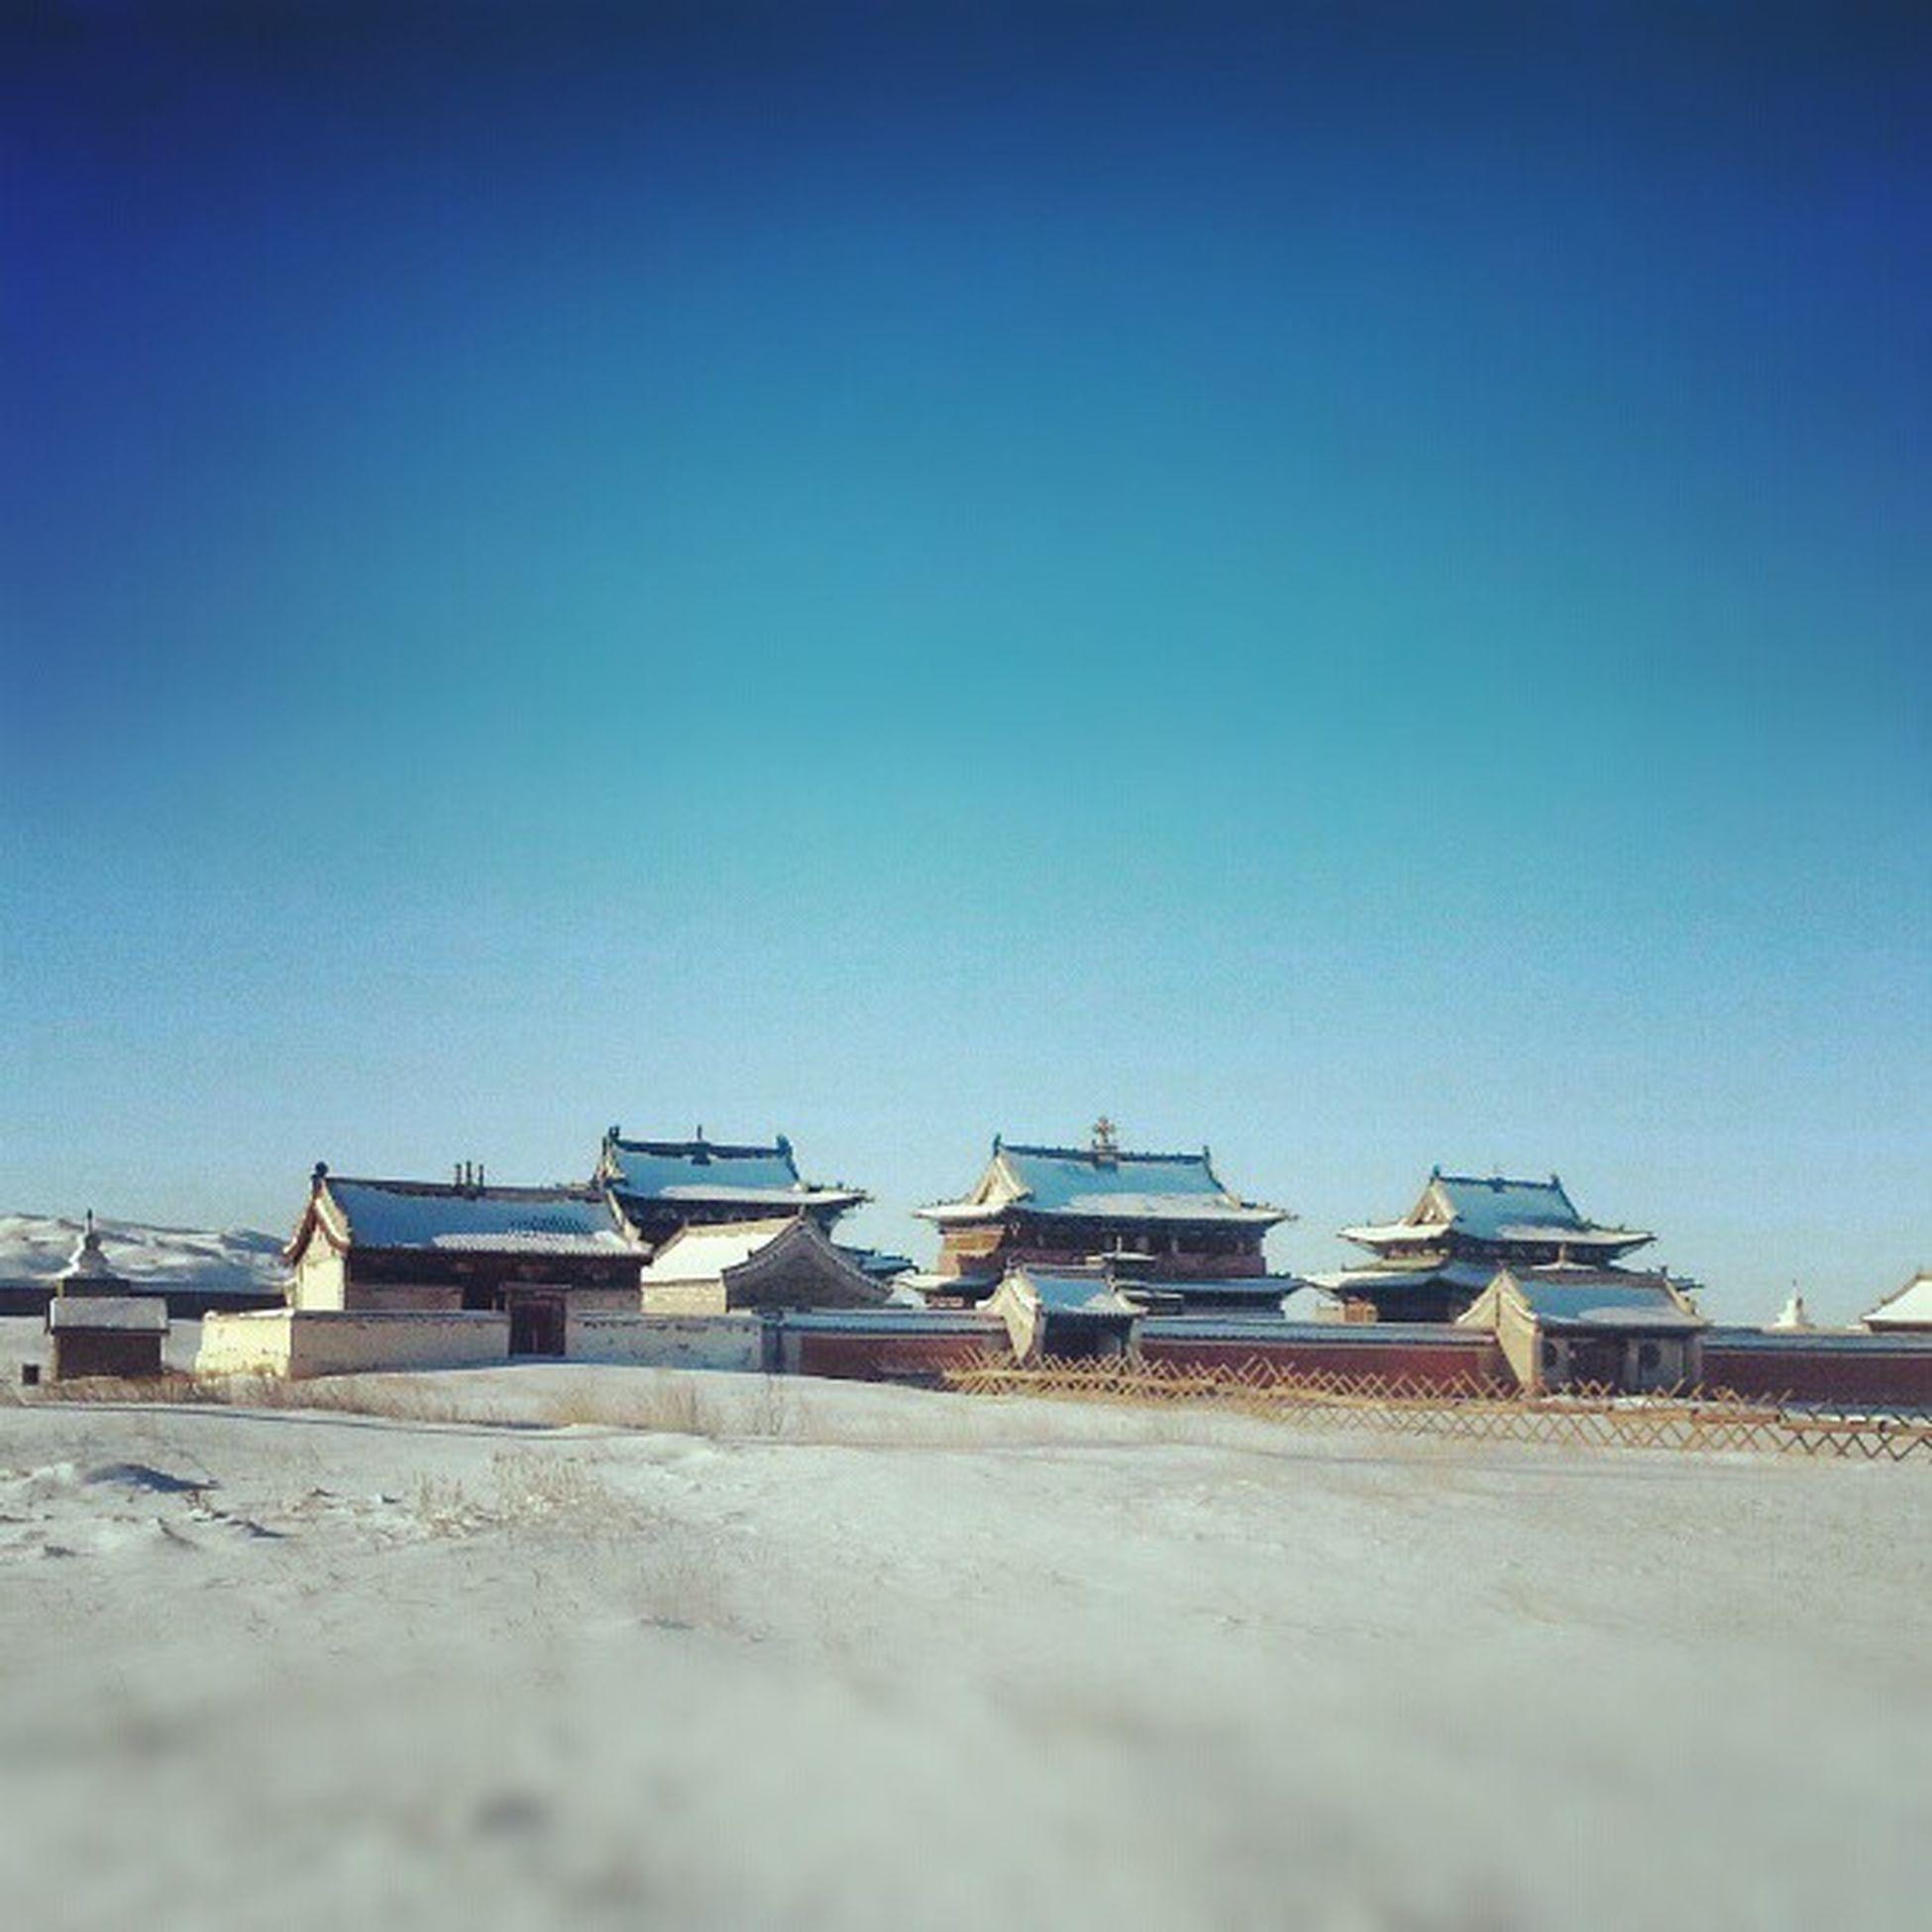 Хархорин эрдэнэзуу хийд Mongolia Uvurhangai Country Harhorin ancient city kharkorum sanctuary museum winter snow bluesky